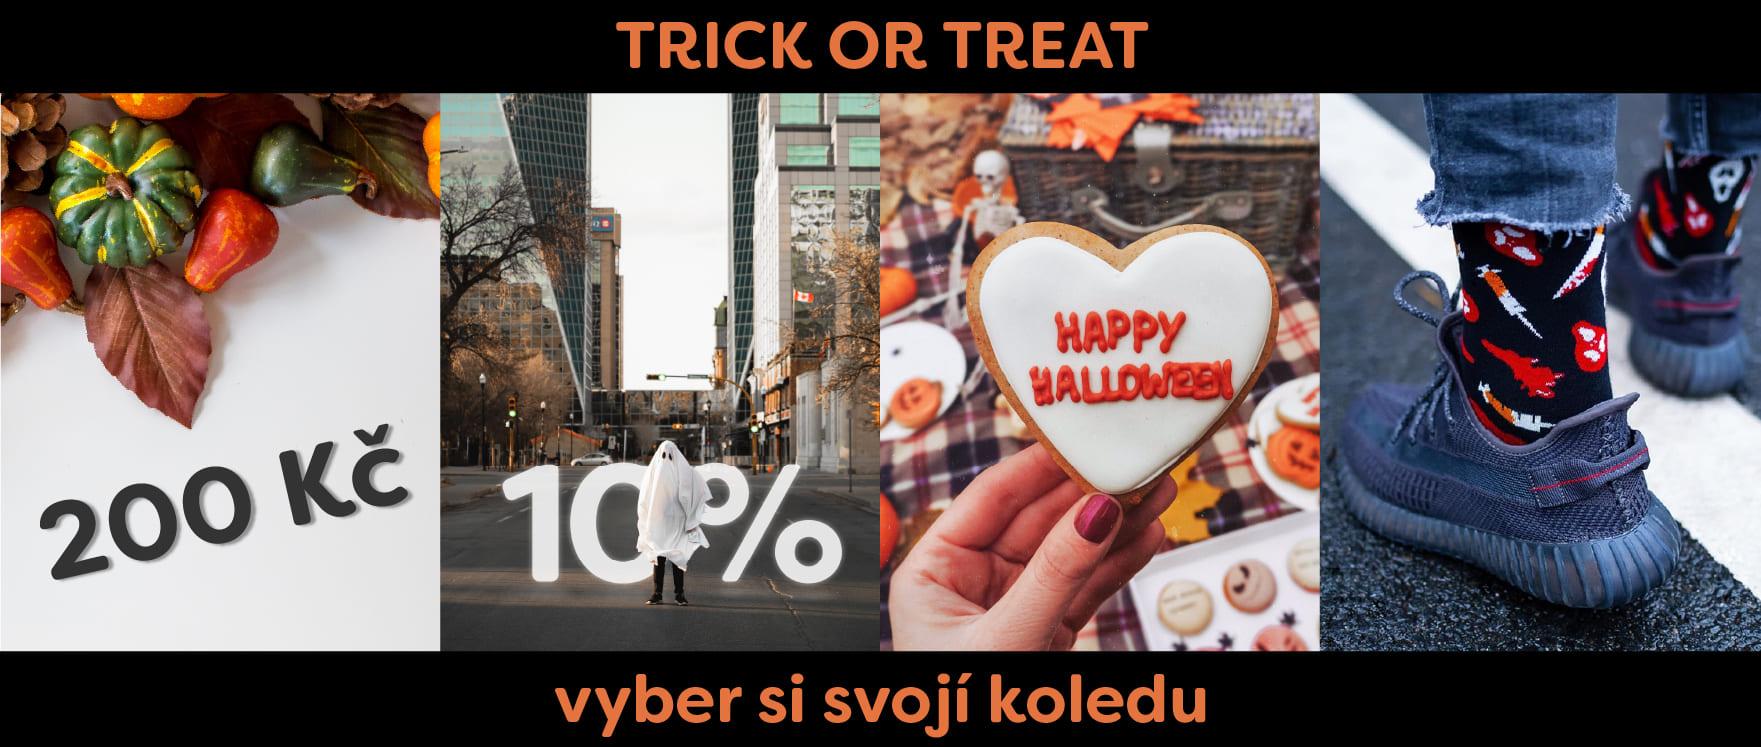 halloween na eimo.cz